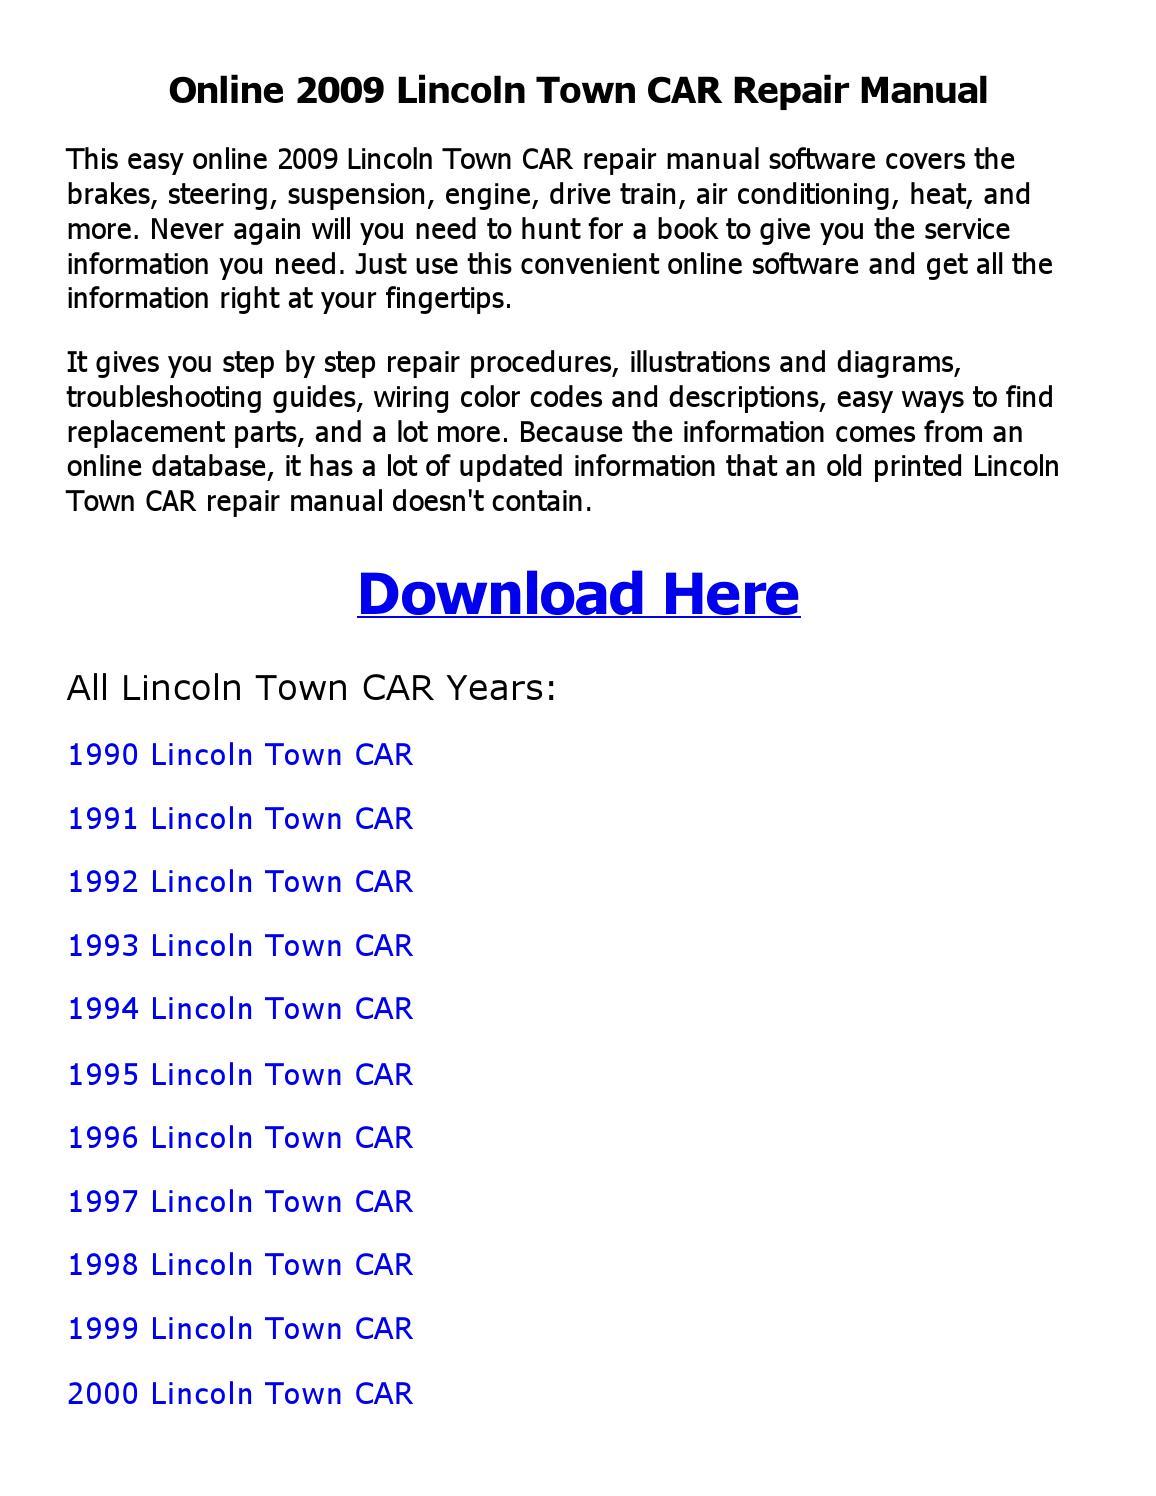 2009 Lincoln Town Car Repair Manual Online By Chaudhary